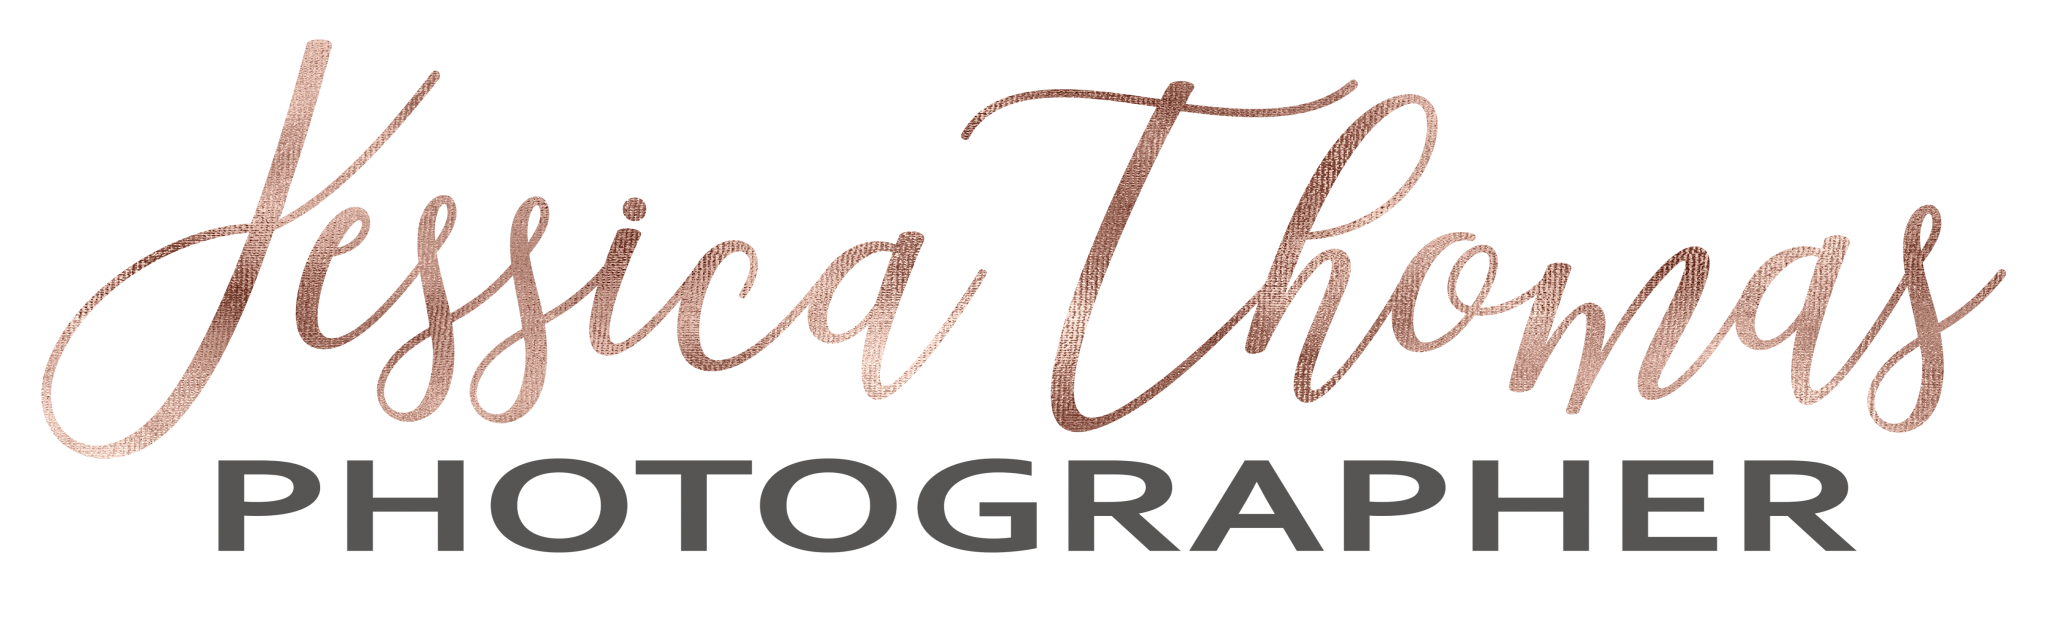 Jessica Thomas Photographer